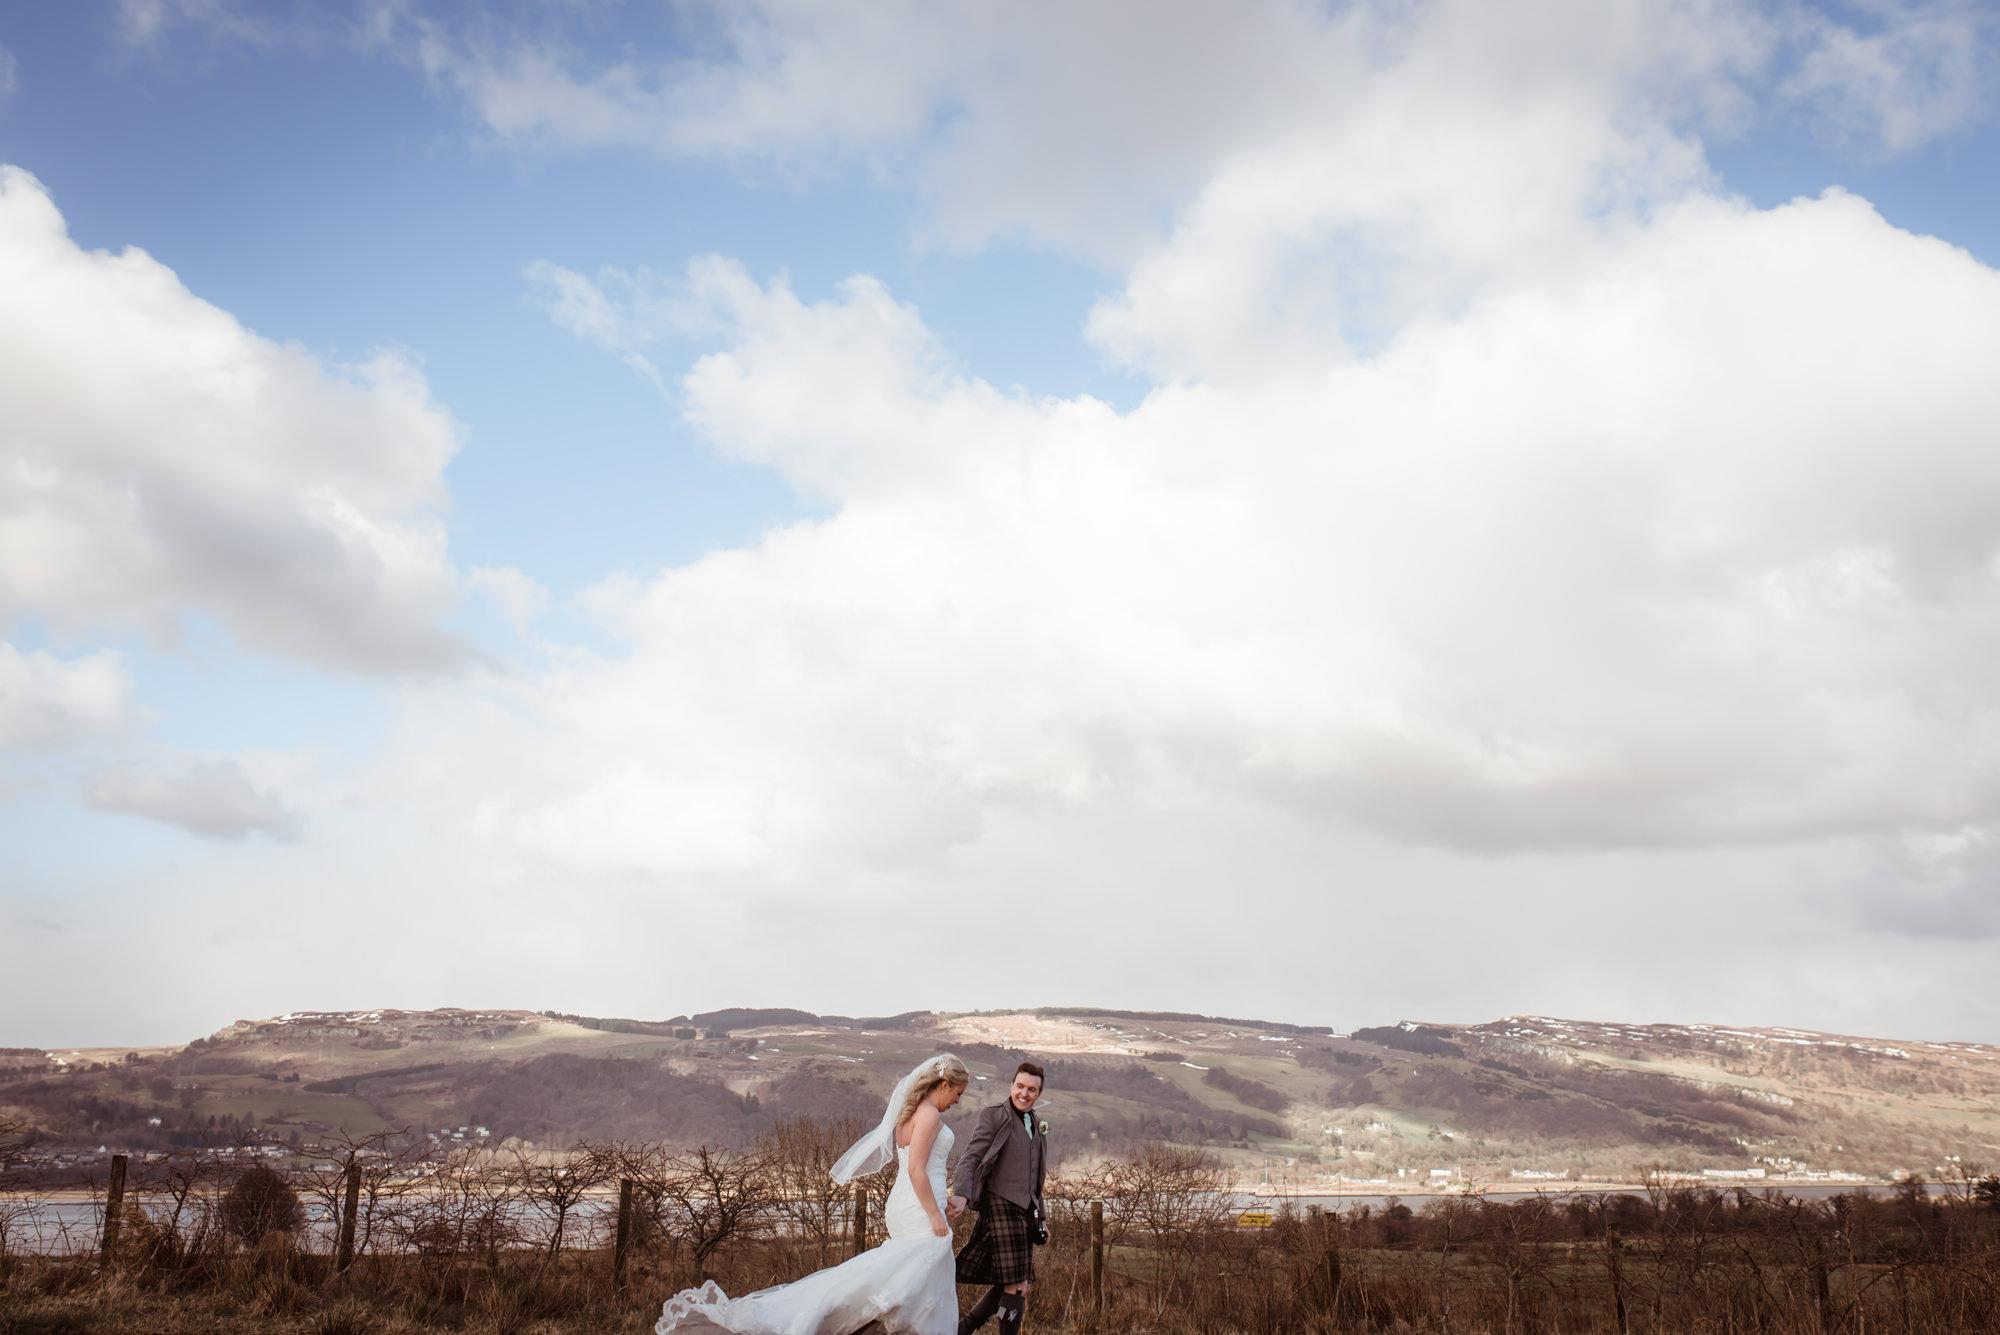 ingliston-wedding-photographer.jpg